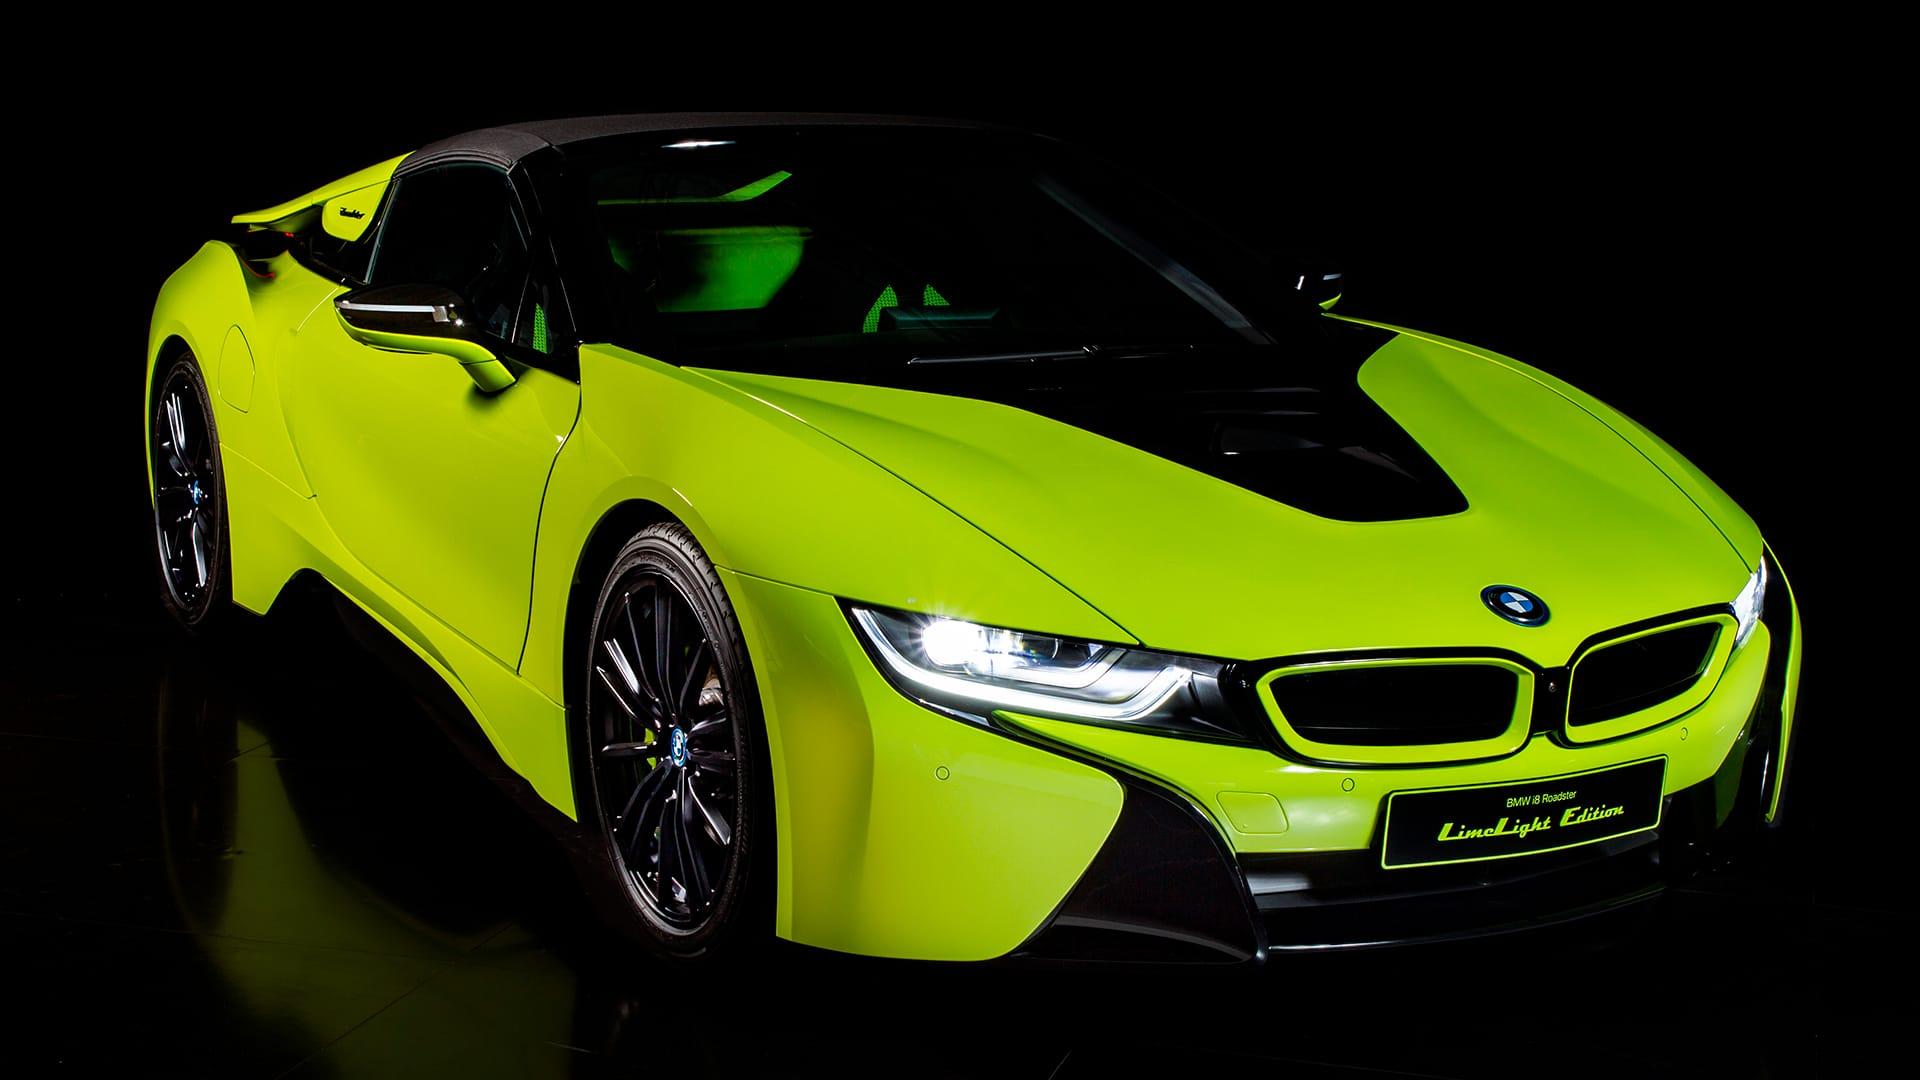 bmw-i8-roadster-limelight-edition-con-particolari-ancantara-6 -